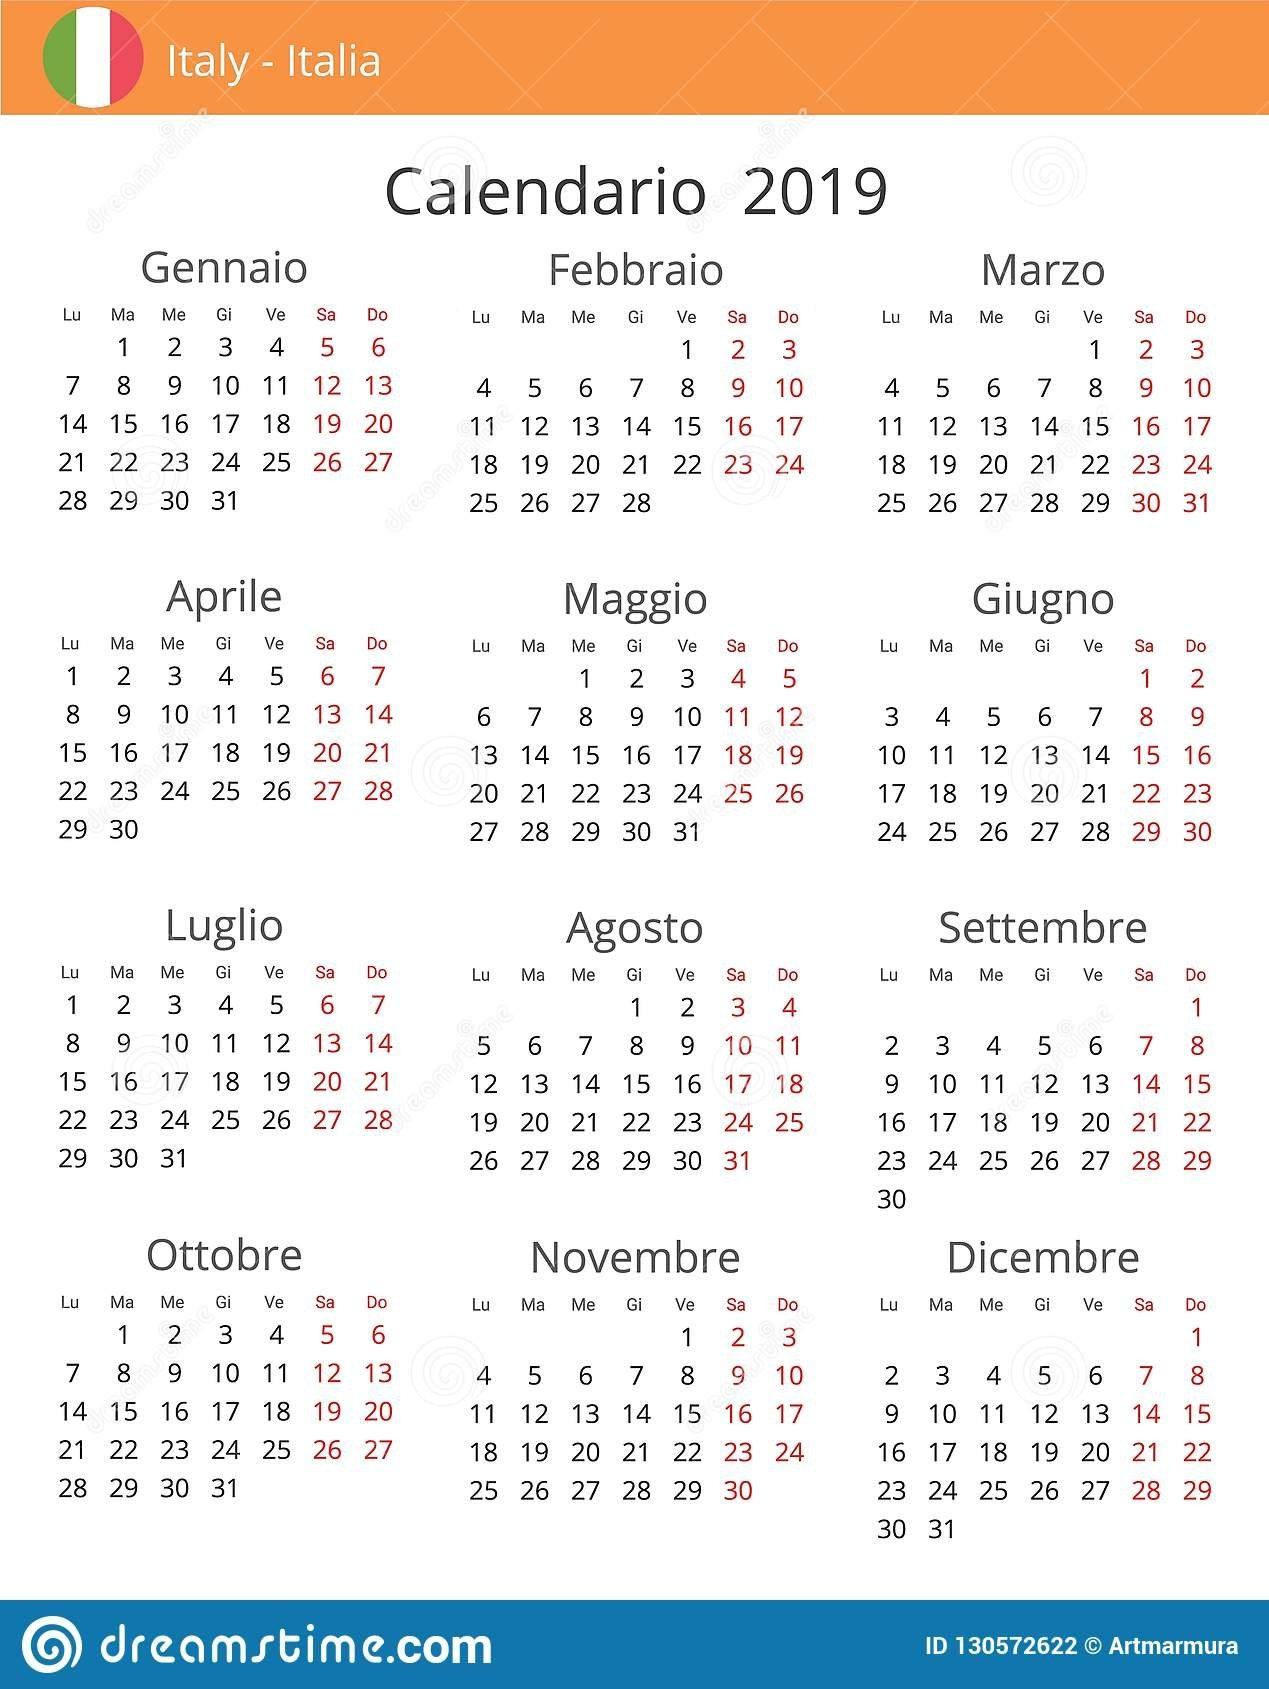 Calendar 2019 Year For Italy Country Stock Illustration Calendar 2019 Italy